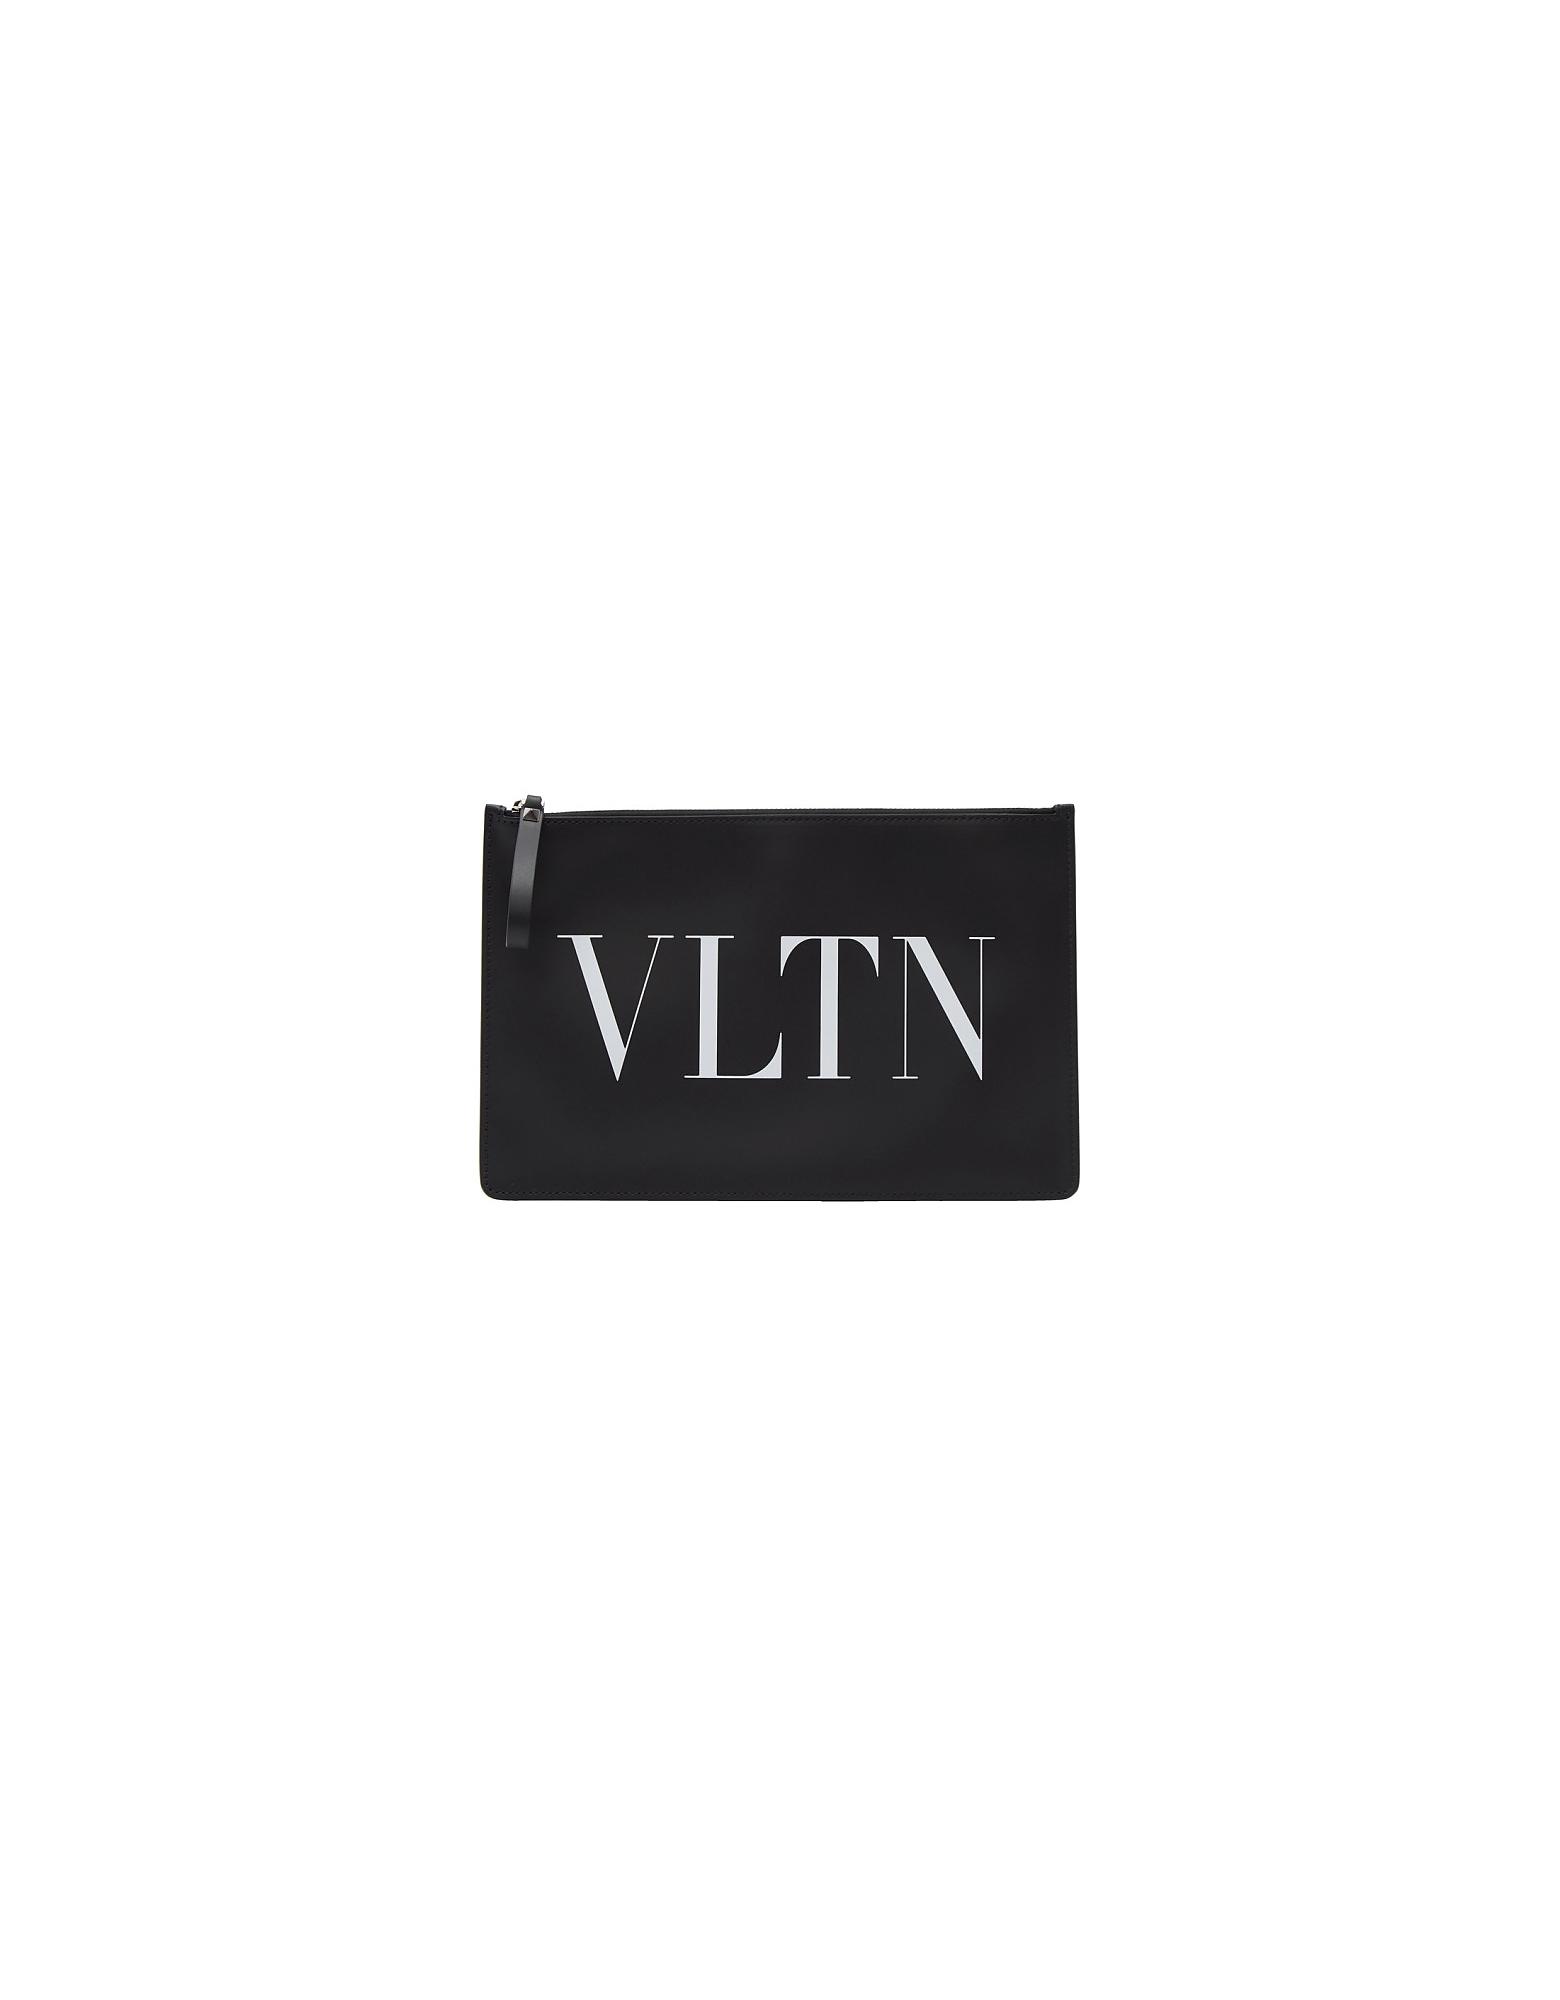 Valentino Designer Men's Bags, Black Valentino Garavani Large VLTN Pouch